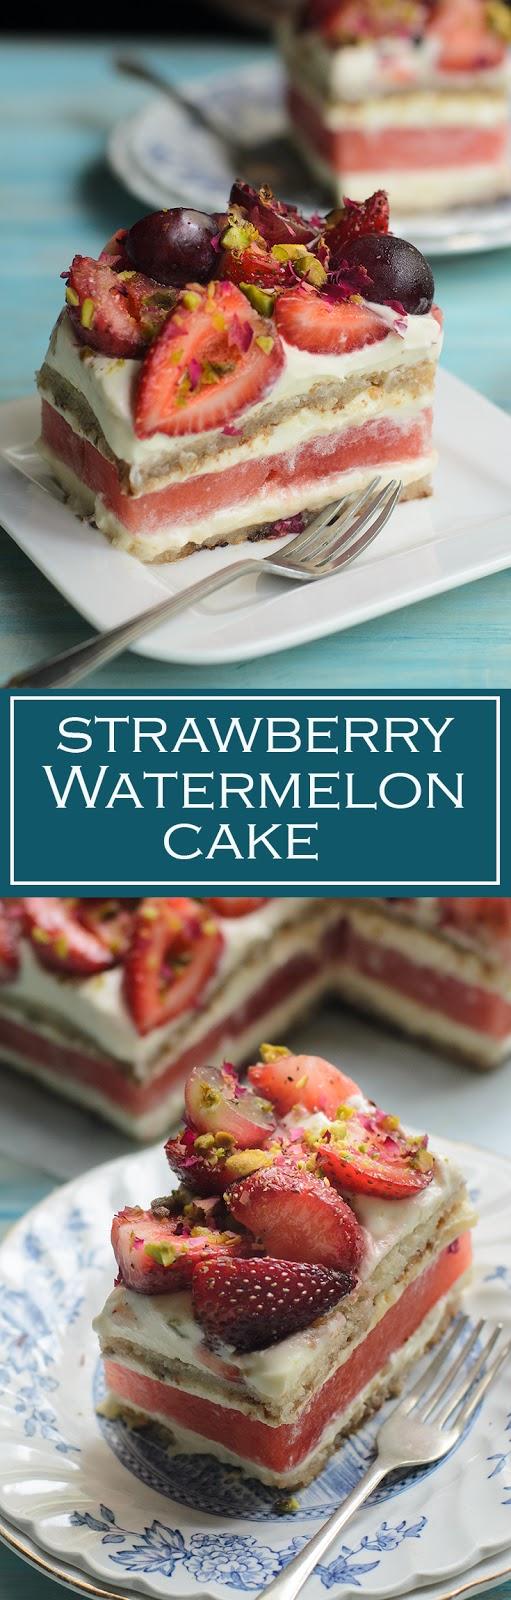 copycat Watermelon and Strawberry Cake image